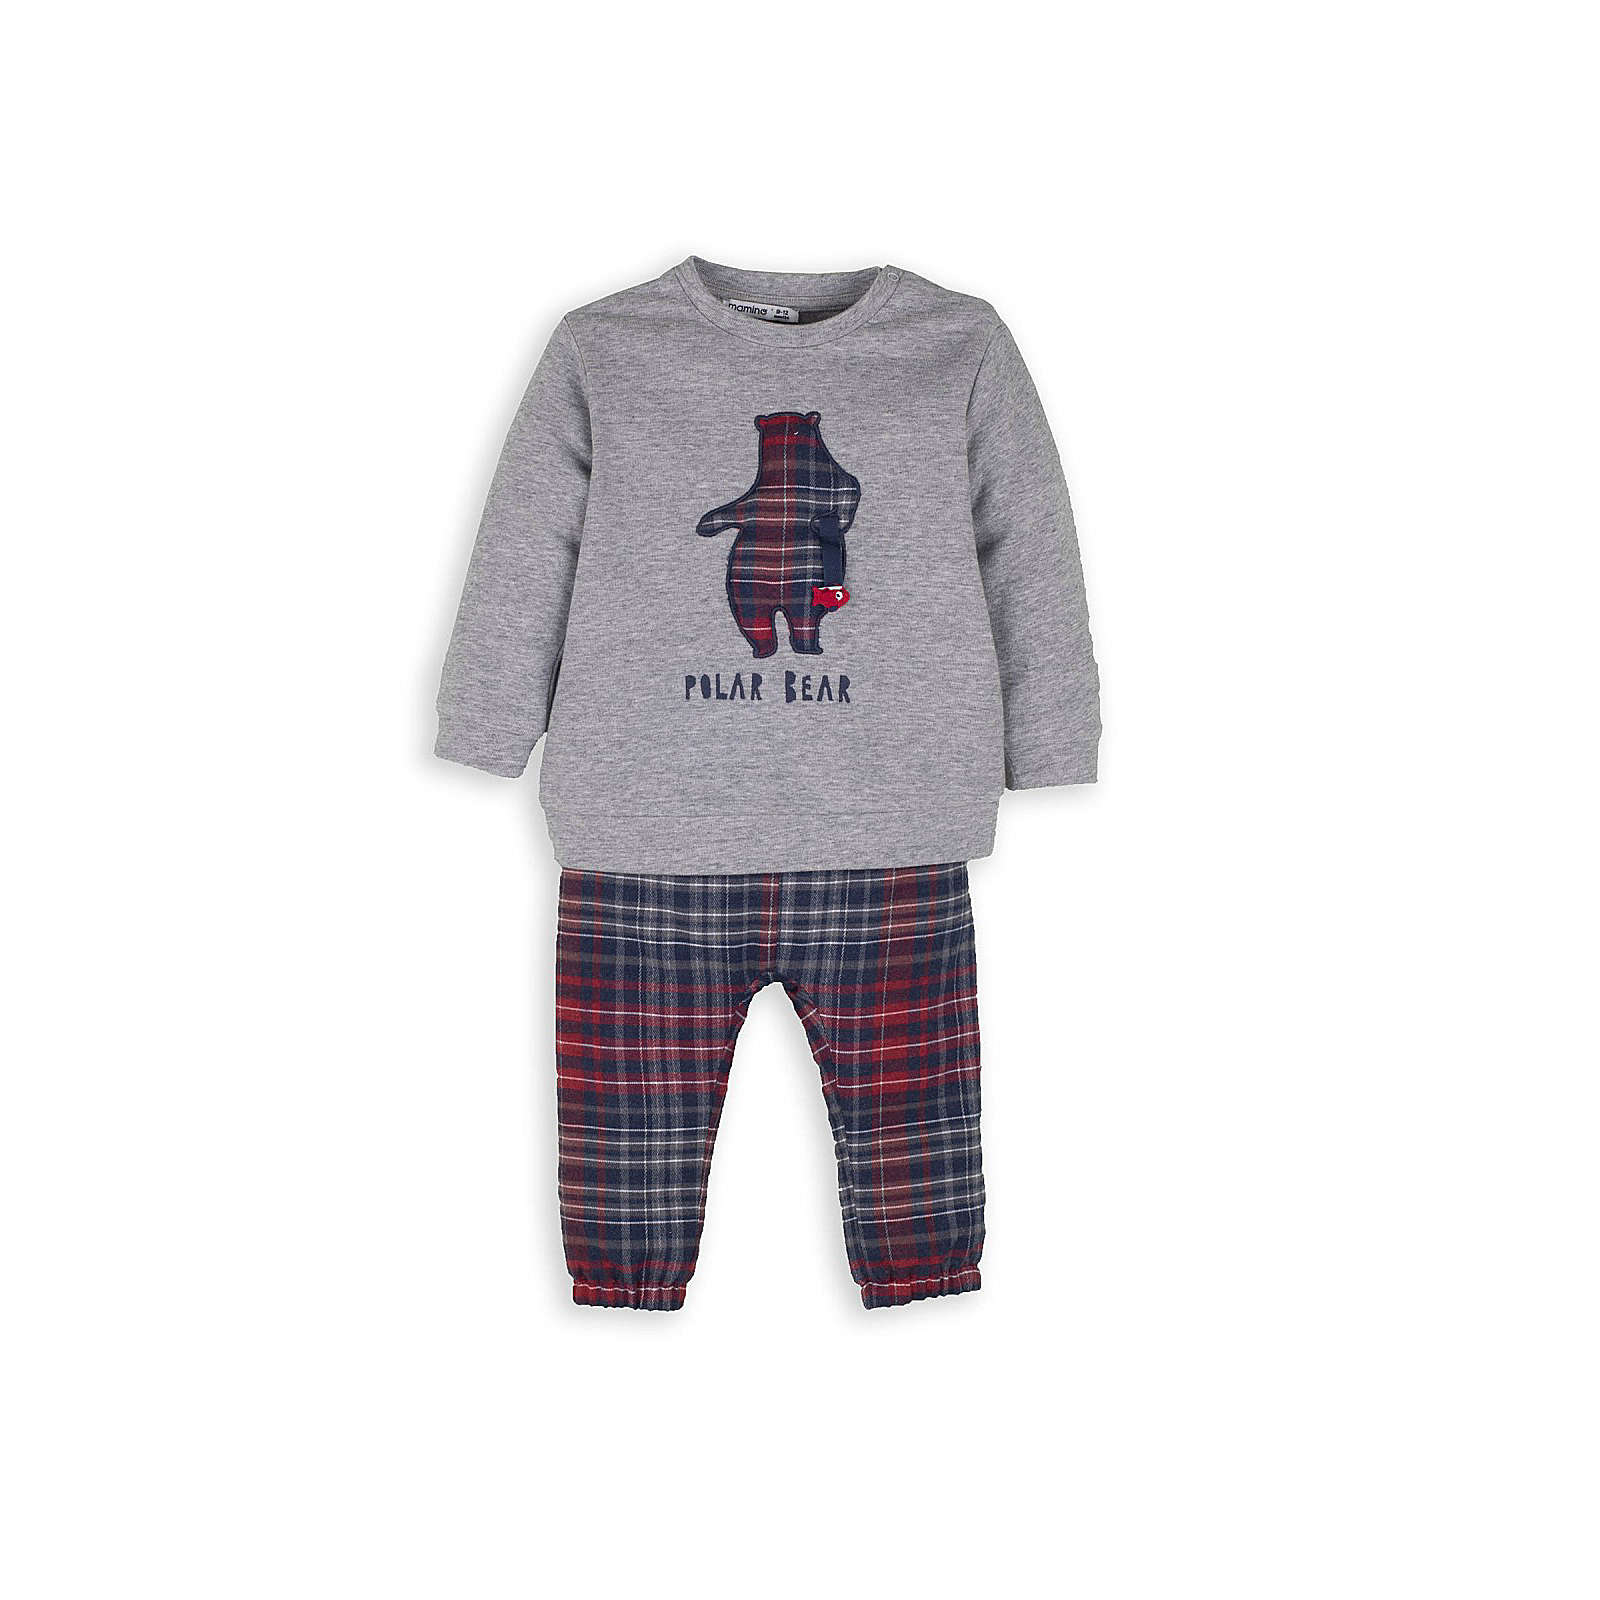 mamino Jungen Schlafanzug -Polar Bear Anzüge grau Junge Gr. 62/68